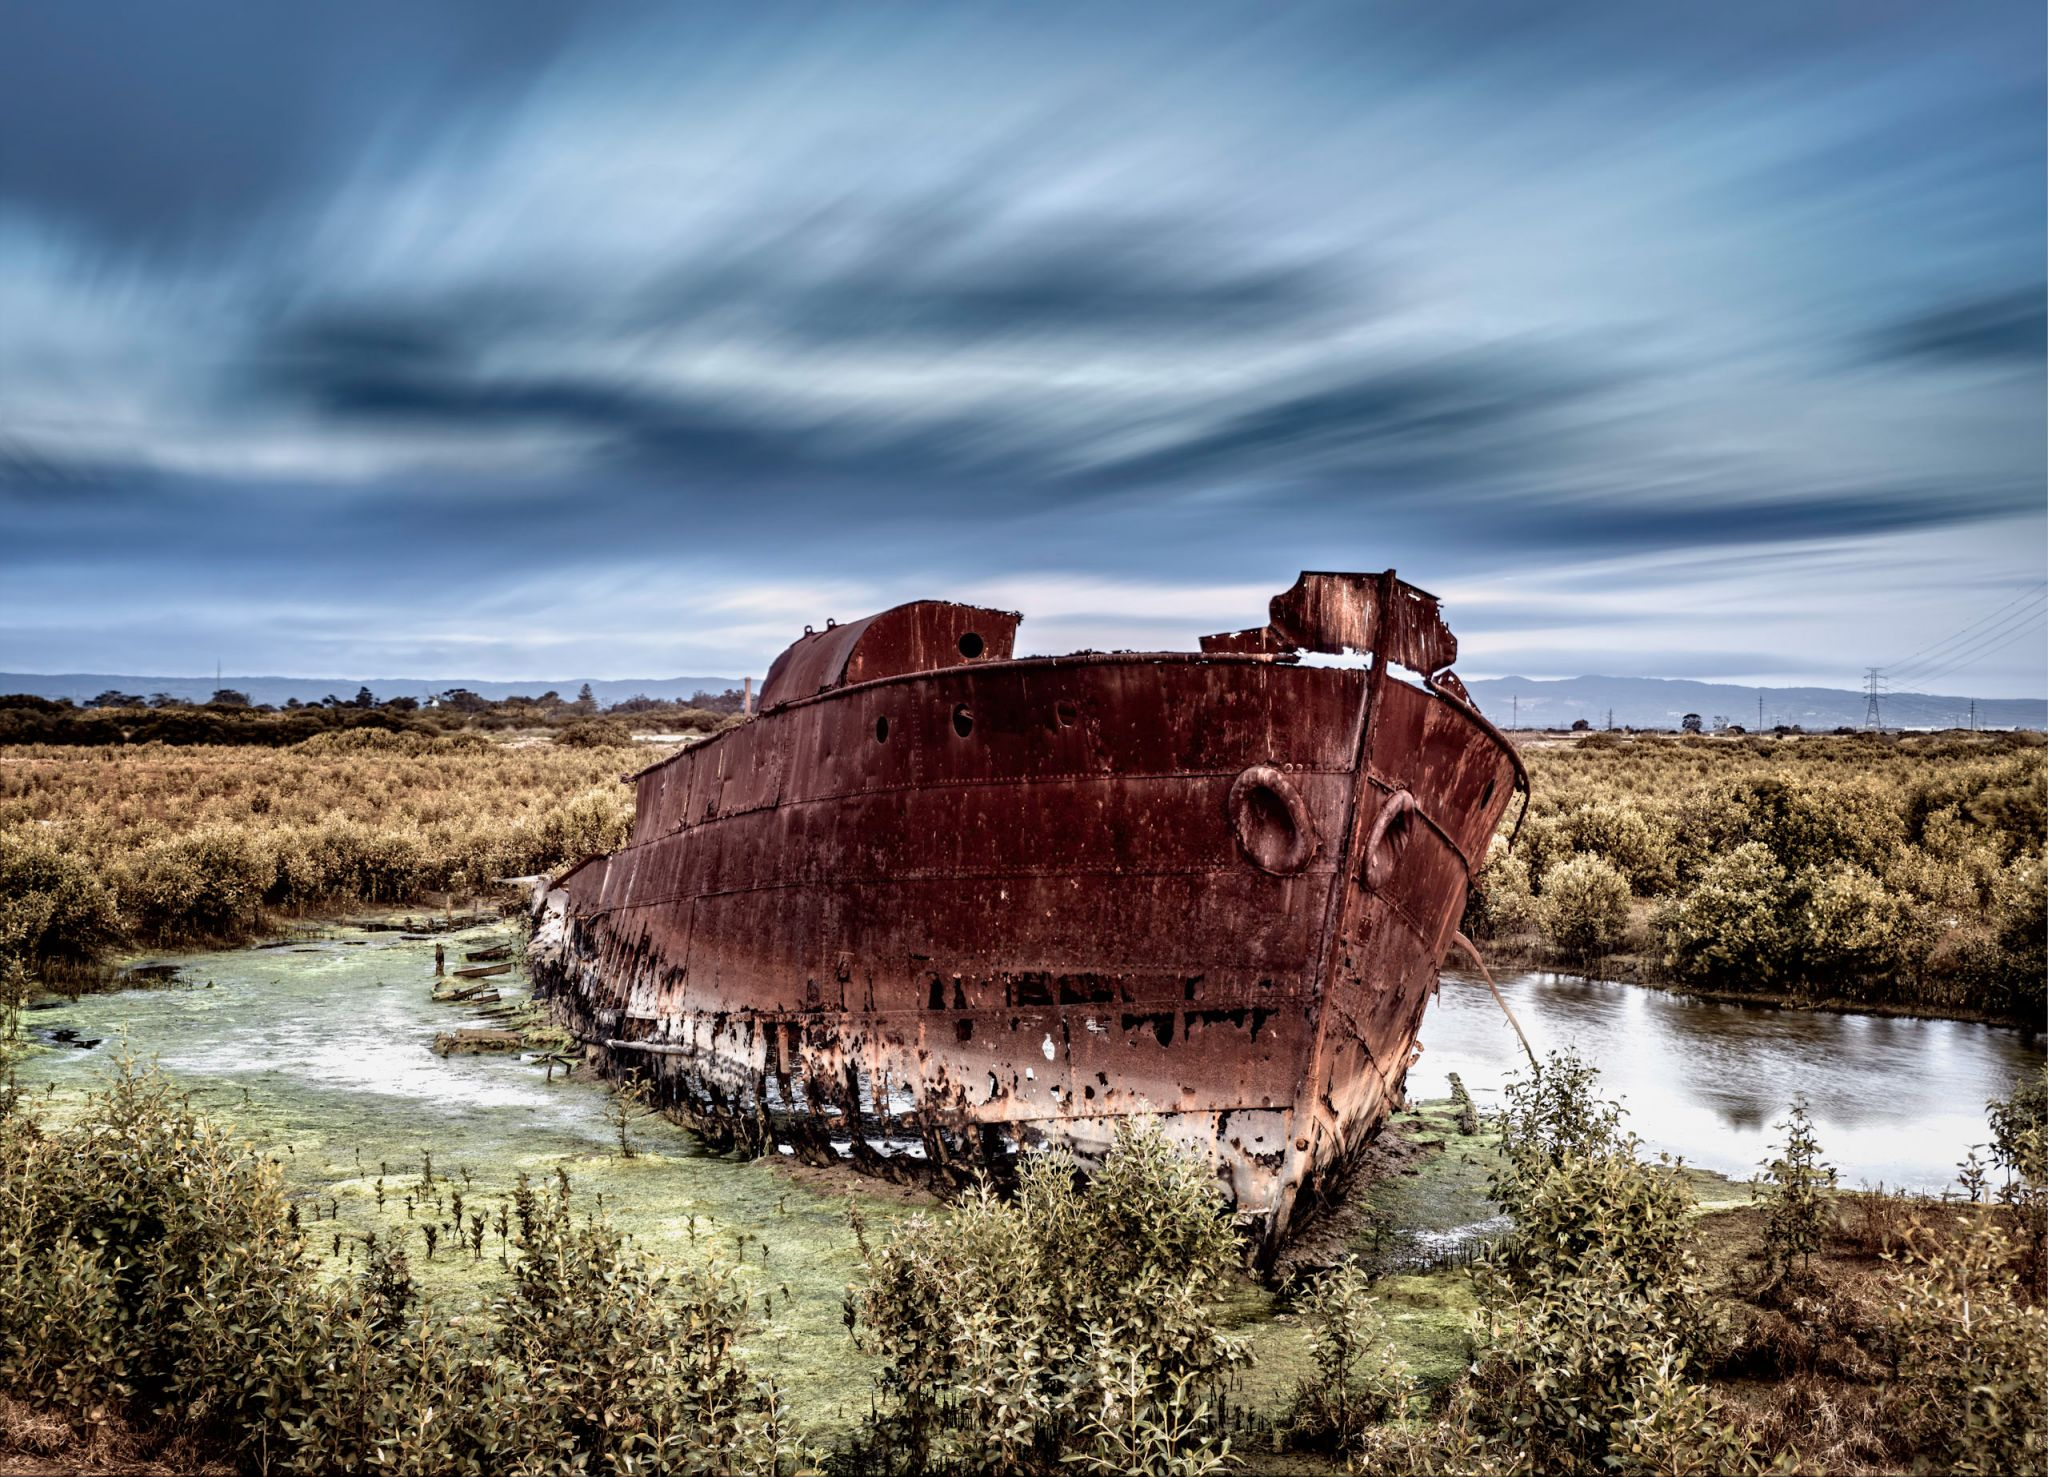 Excelsior Ship Wreck, Australia